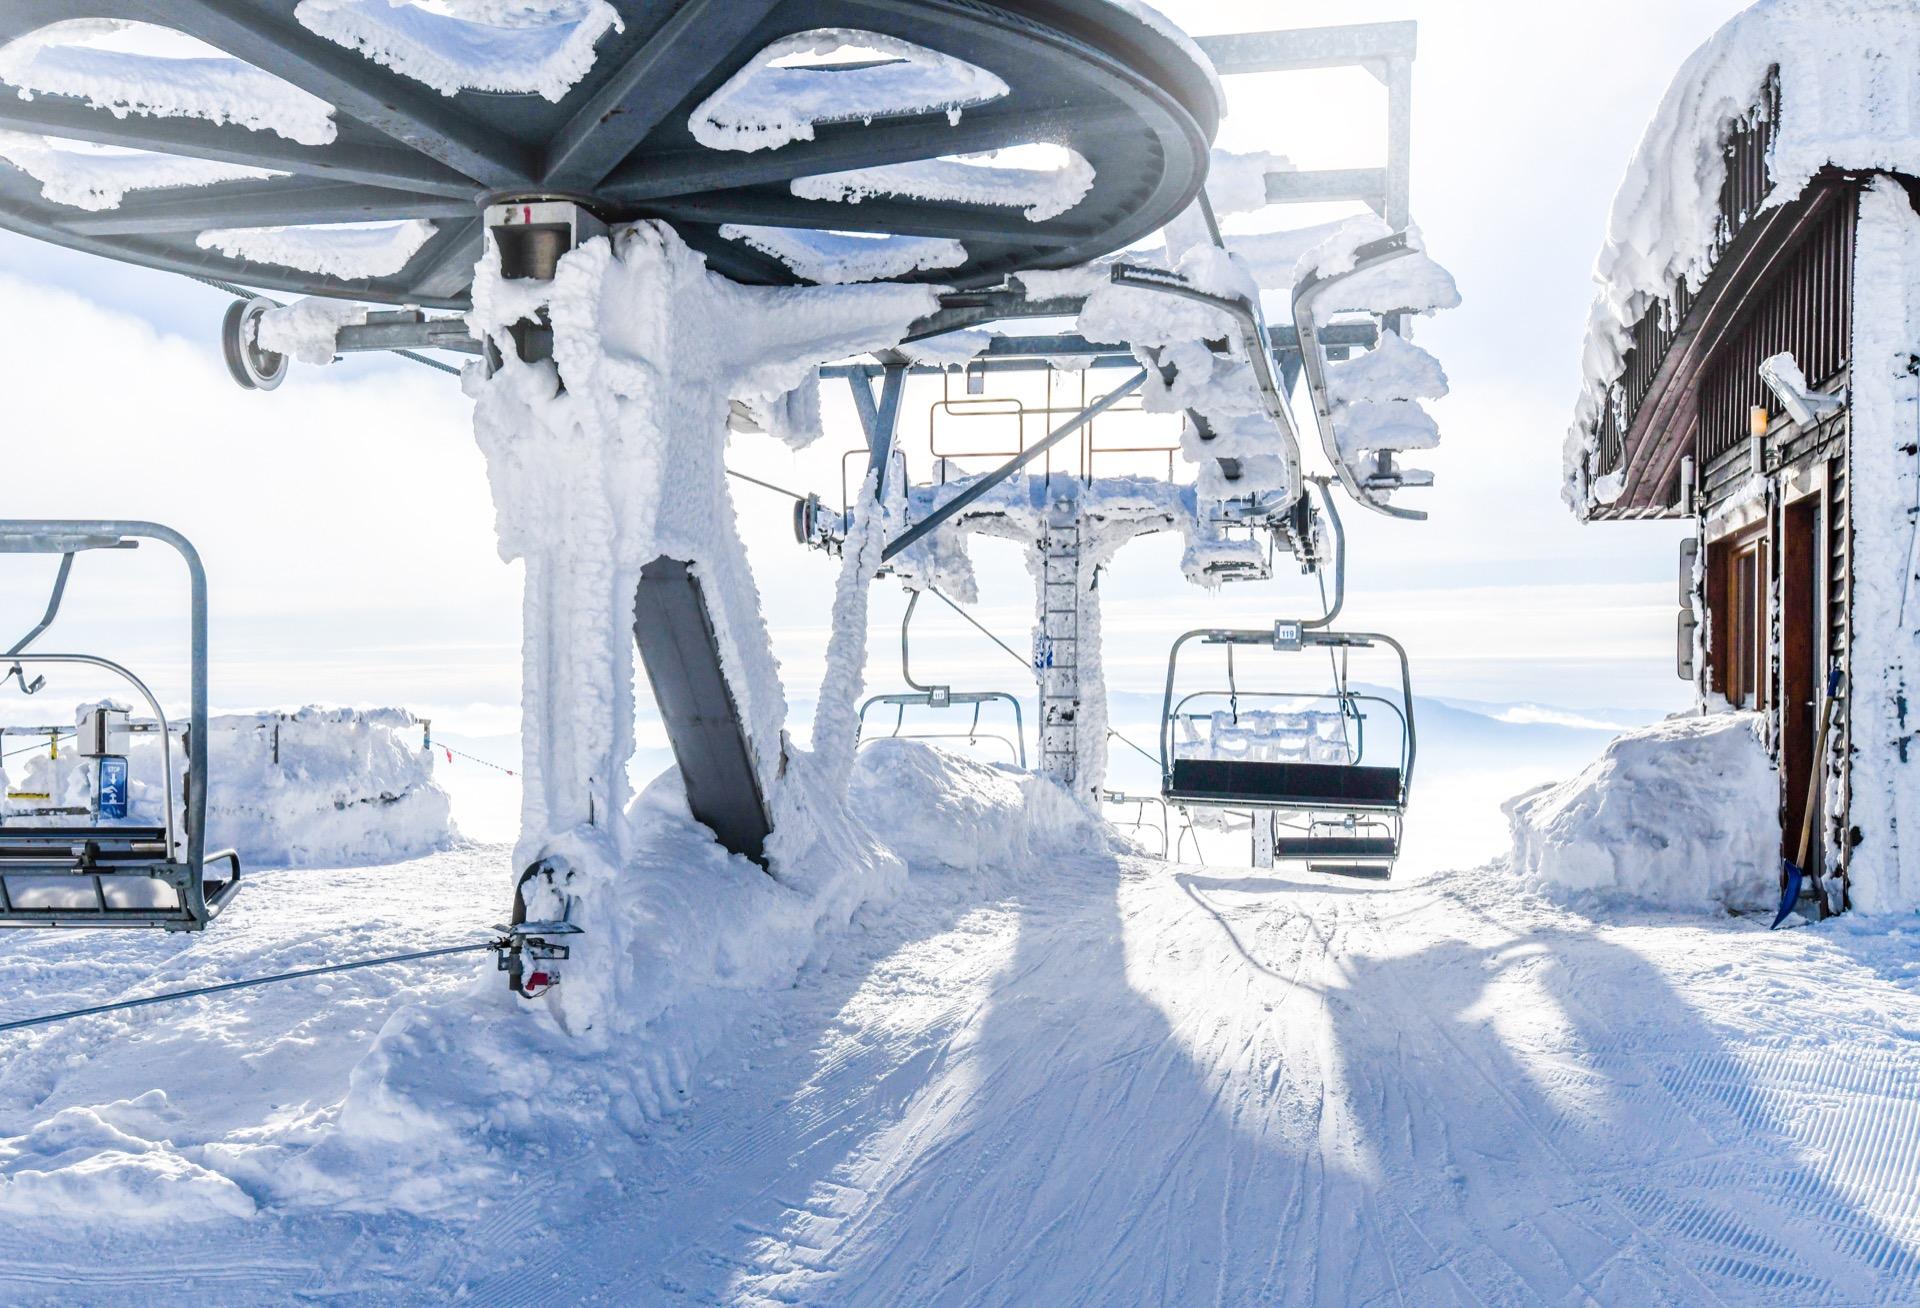 Ski lift at the top of Okanagan Valley ski resort